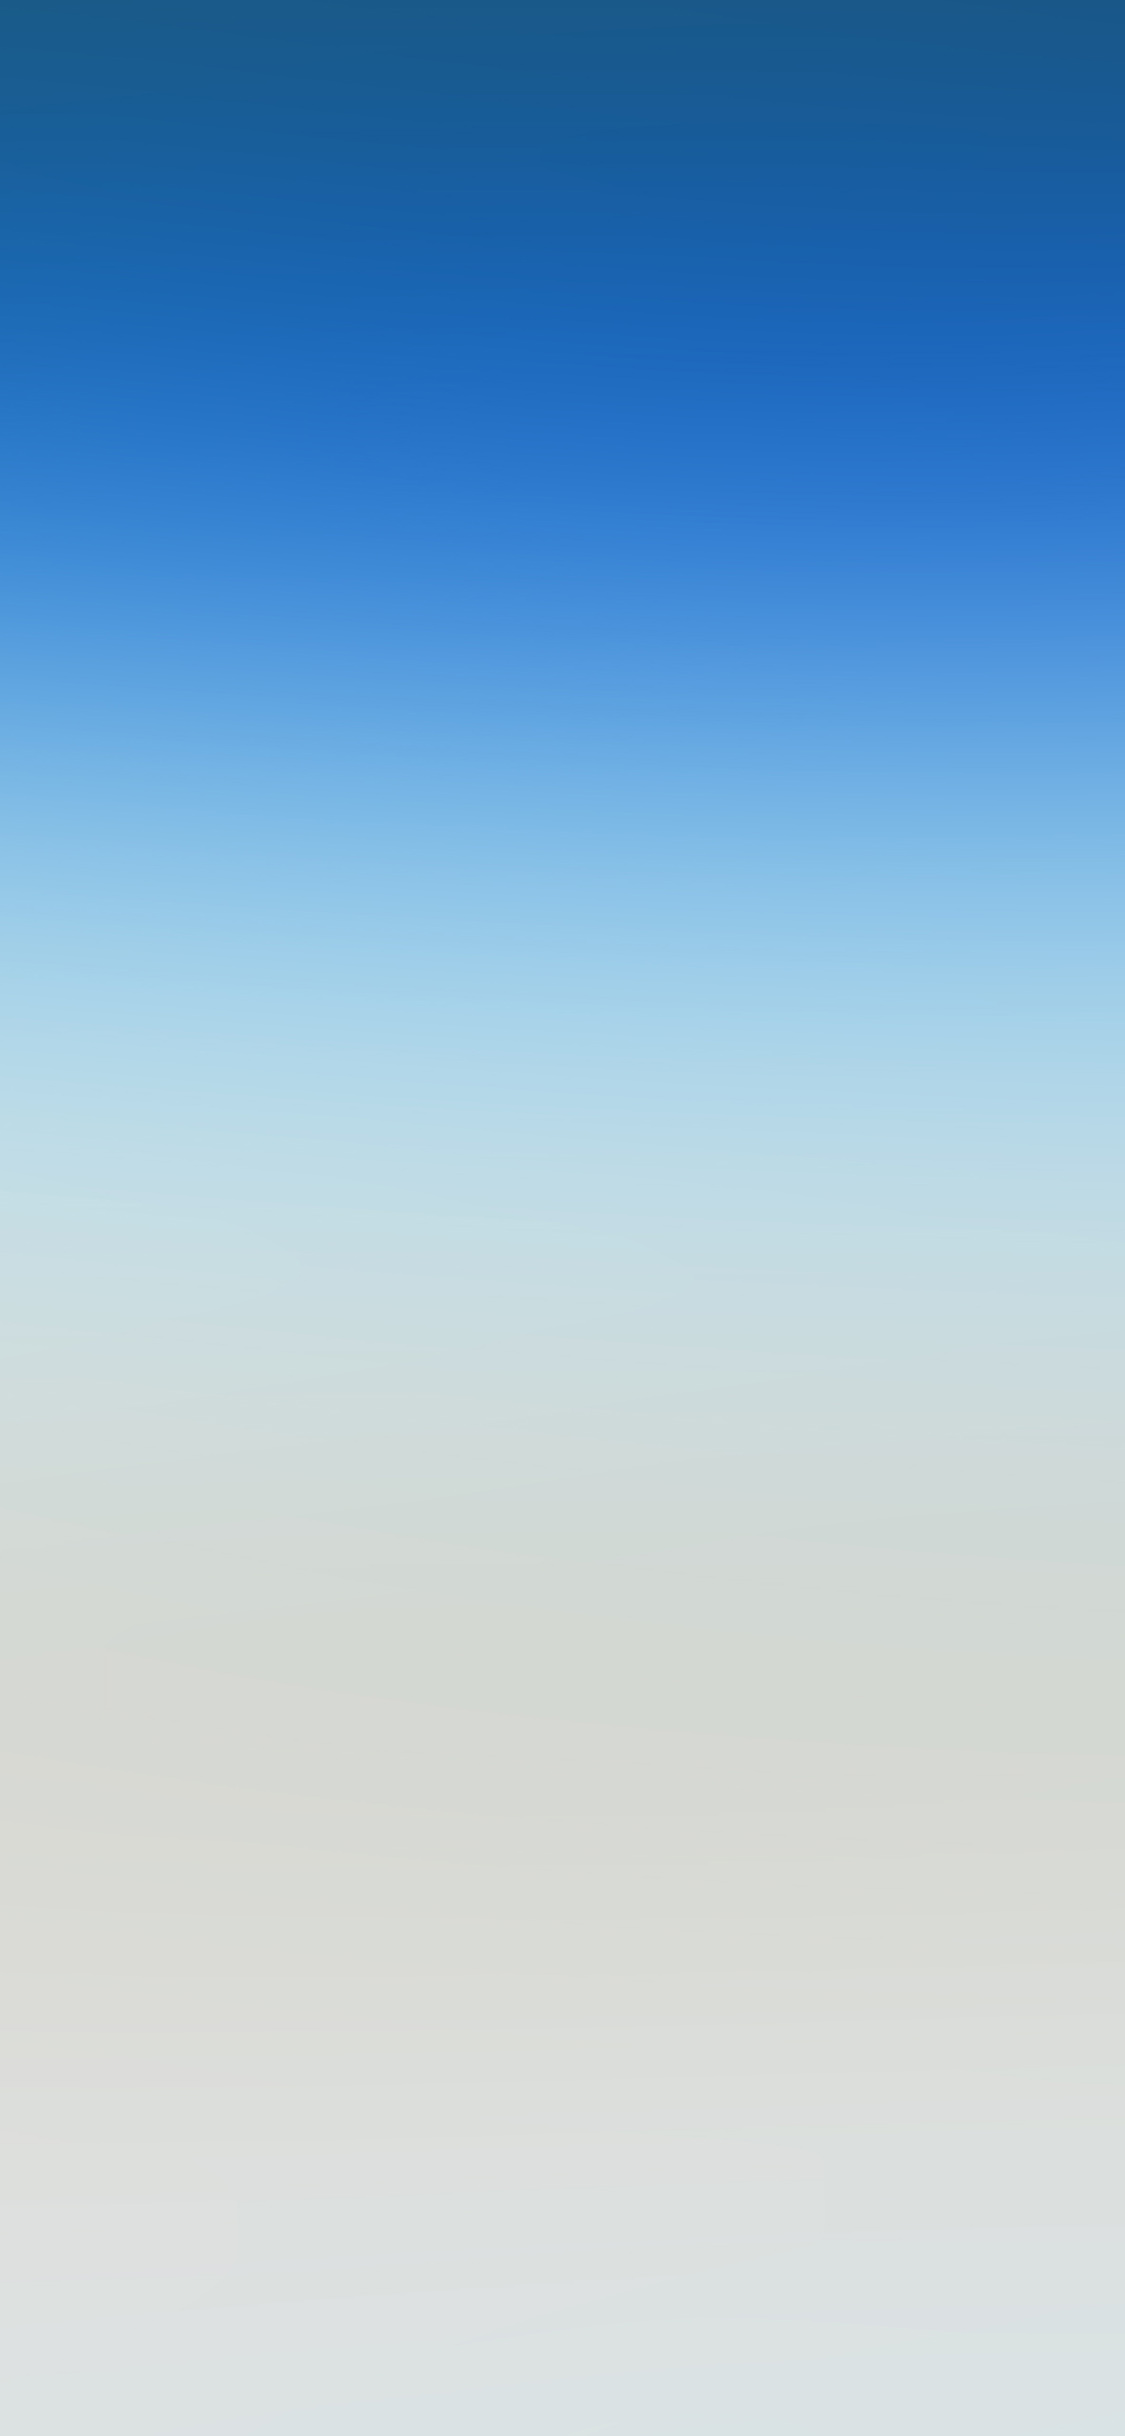 iPhoneXpapers.com-Apple-iPhone-wallpaper-sj57-sky-blue-clear-white-gradation-blur